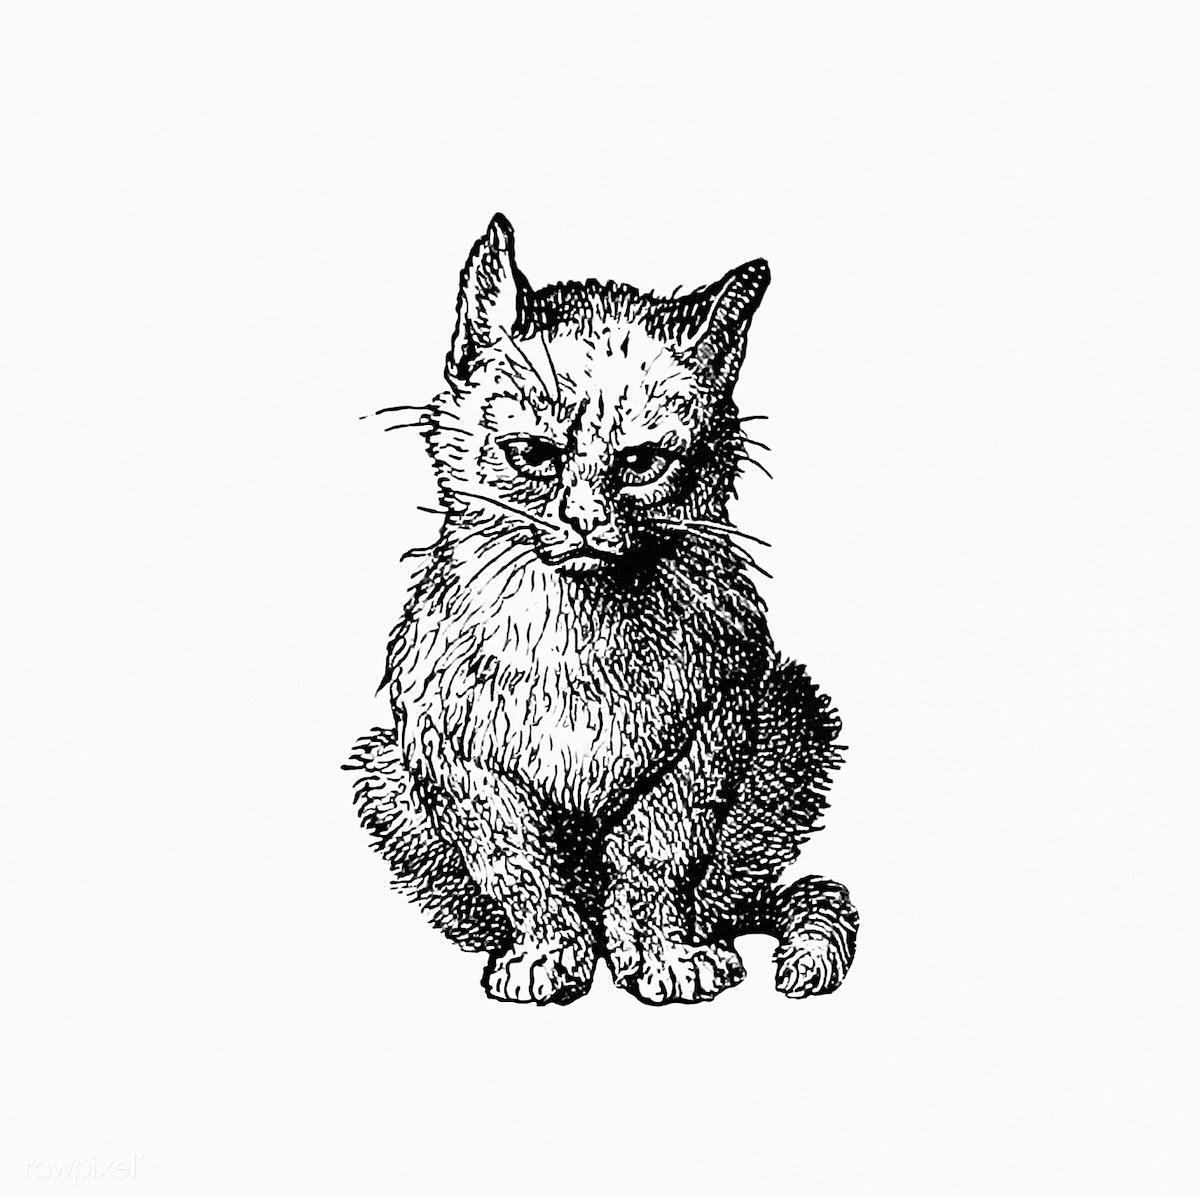 Download Premium Illustration Of Vintage Victorian Style Cat Engraving